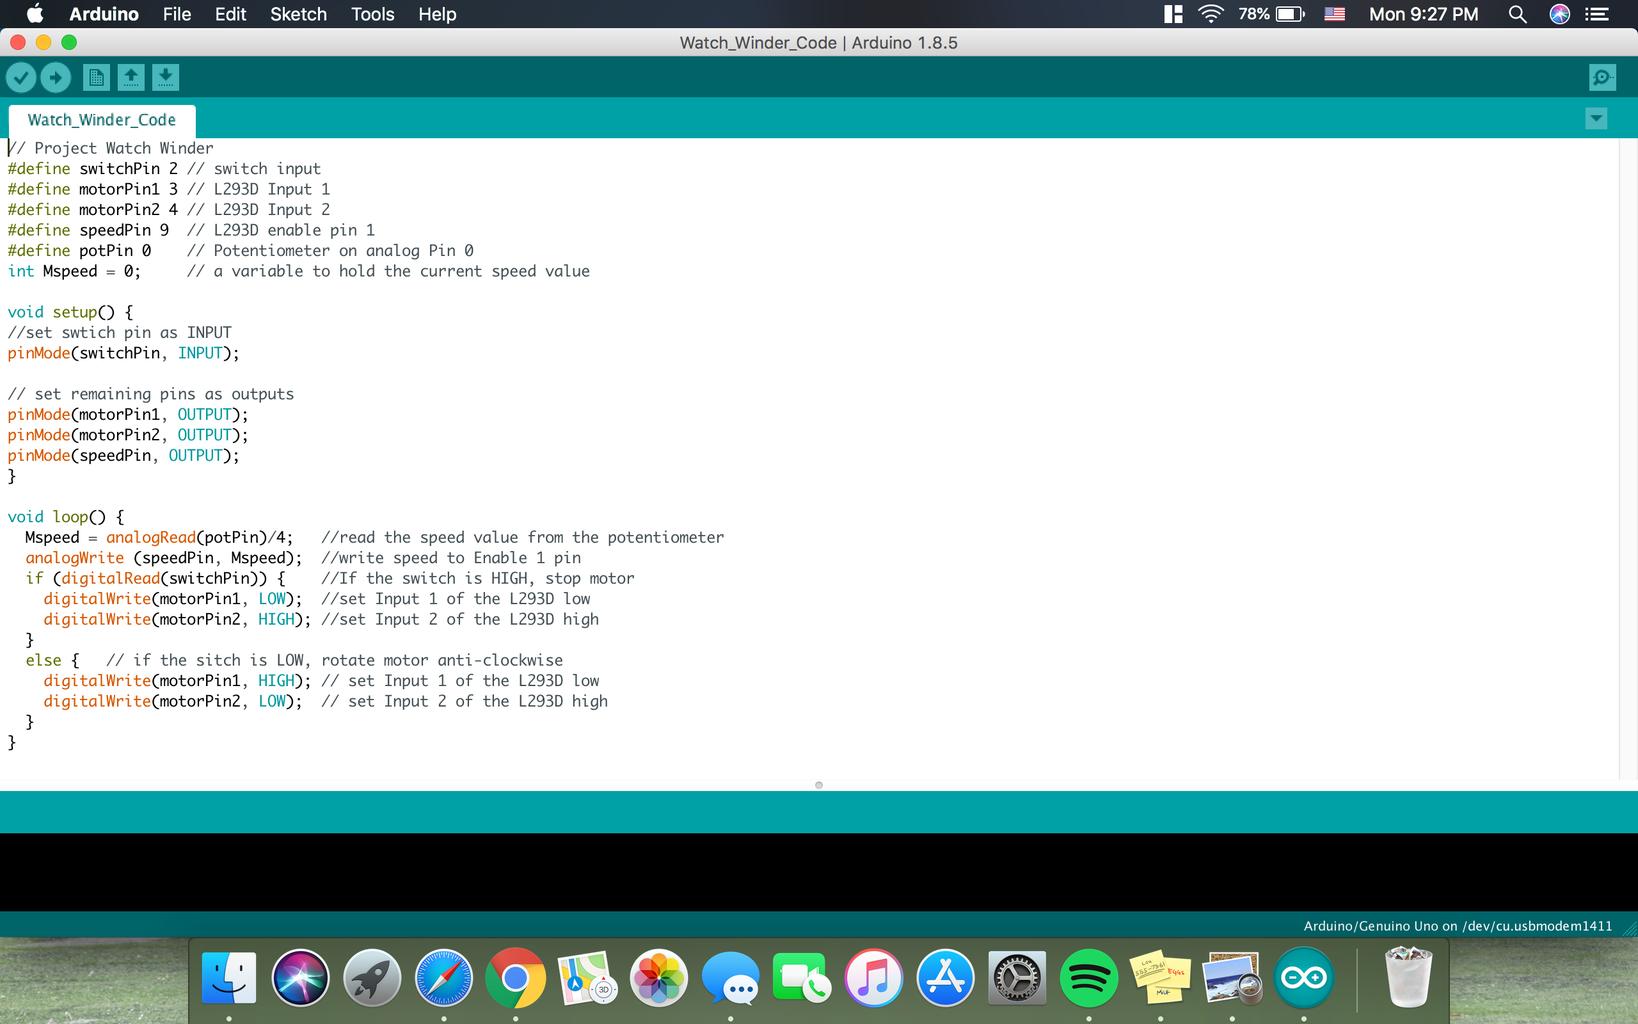 Step 5: Programming the Arduino